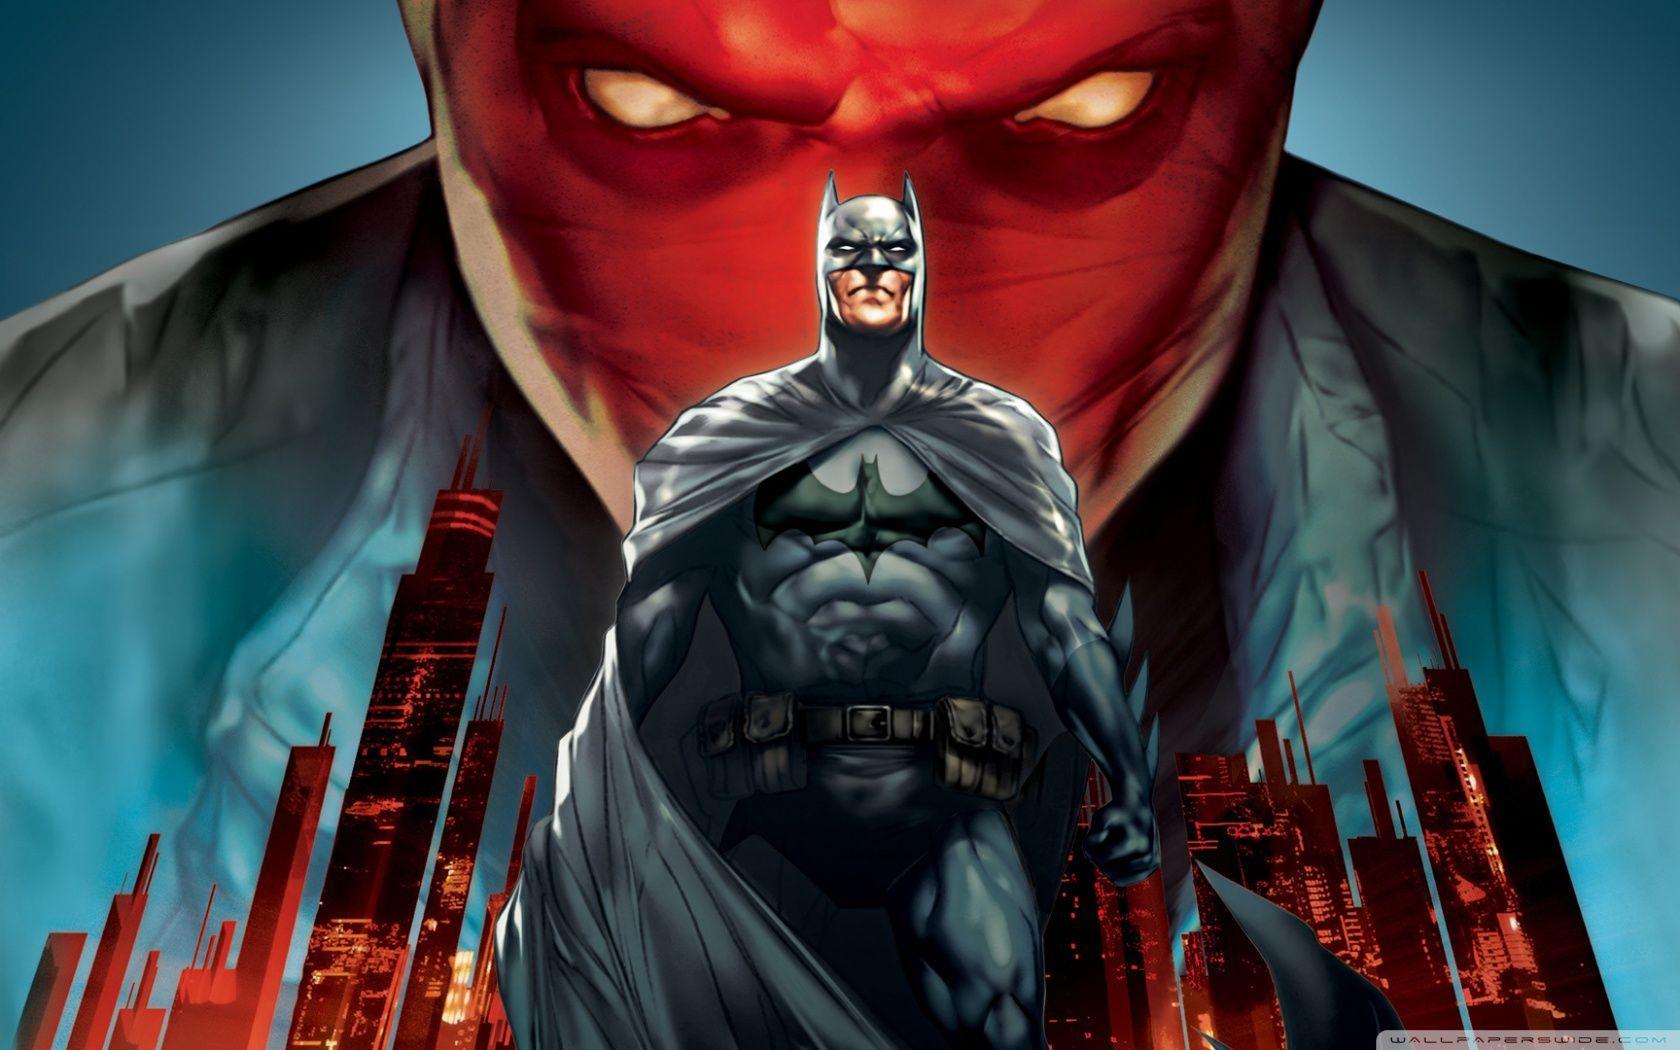 4k Superhero Wallpapers Top Free 4k Superhero Backgrounds